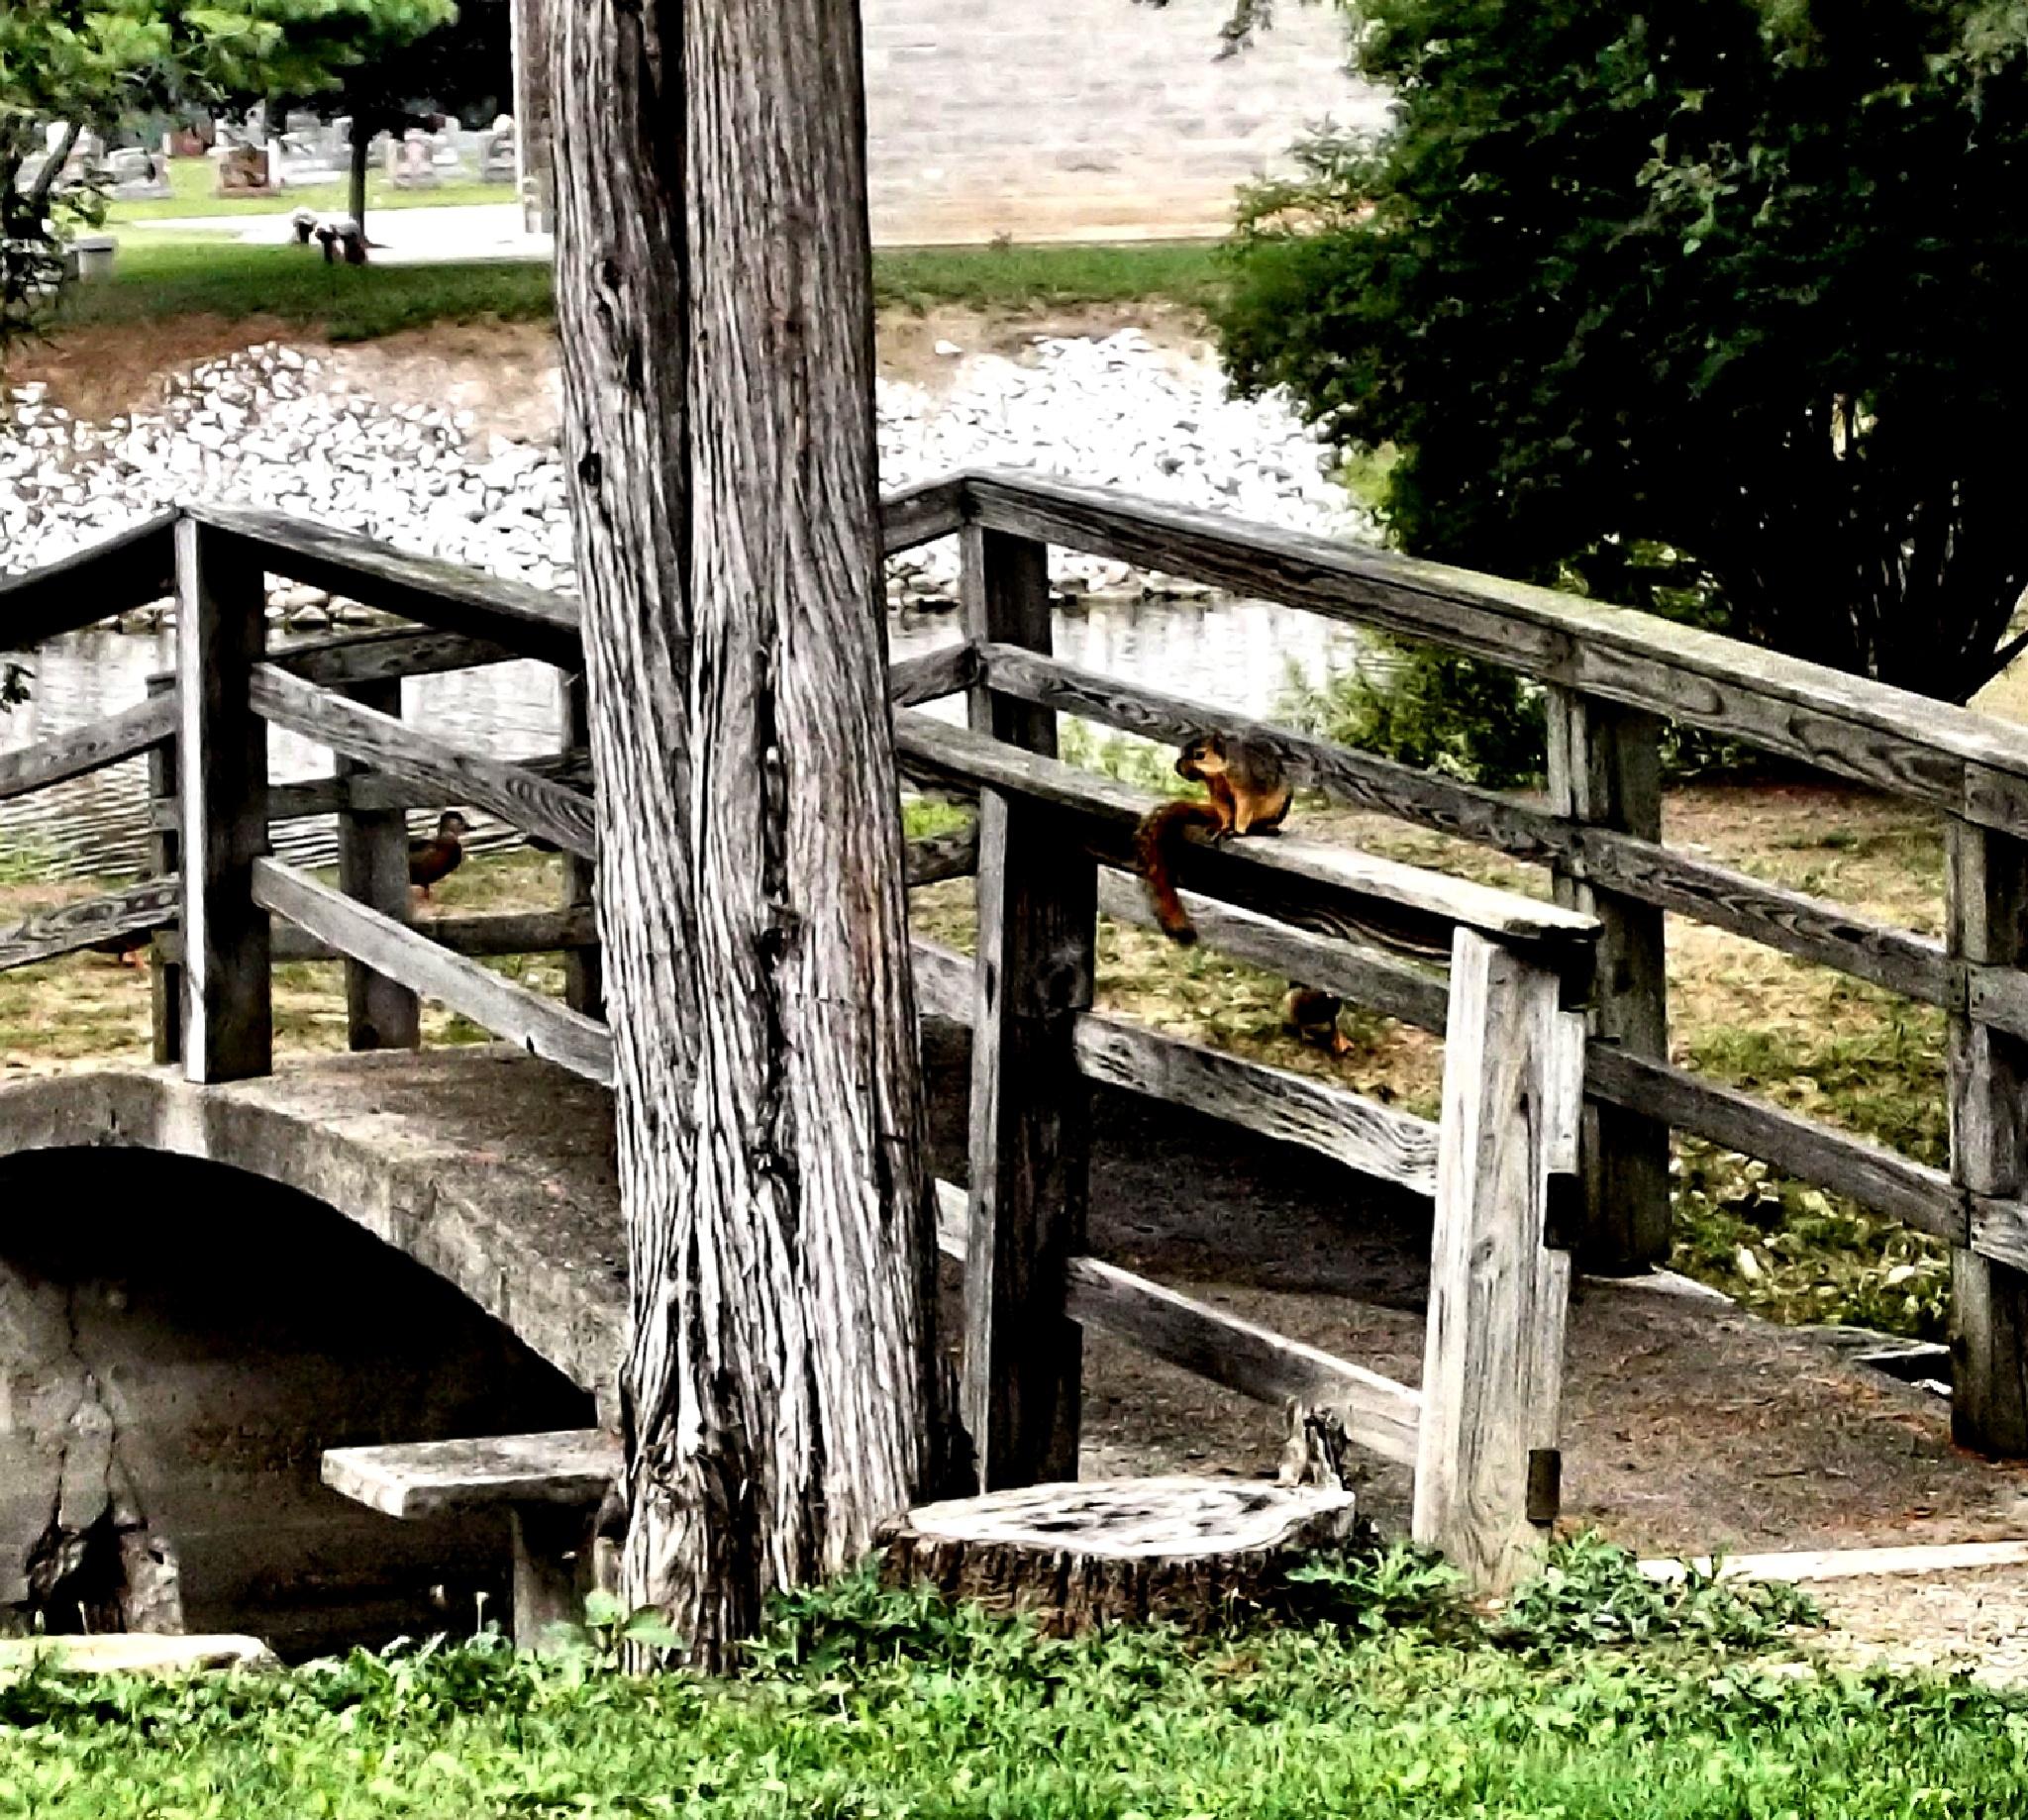 Bridge with squirrel by Tammy Warner Hood